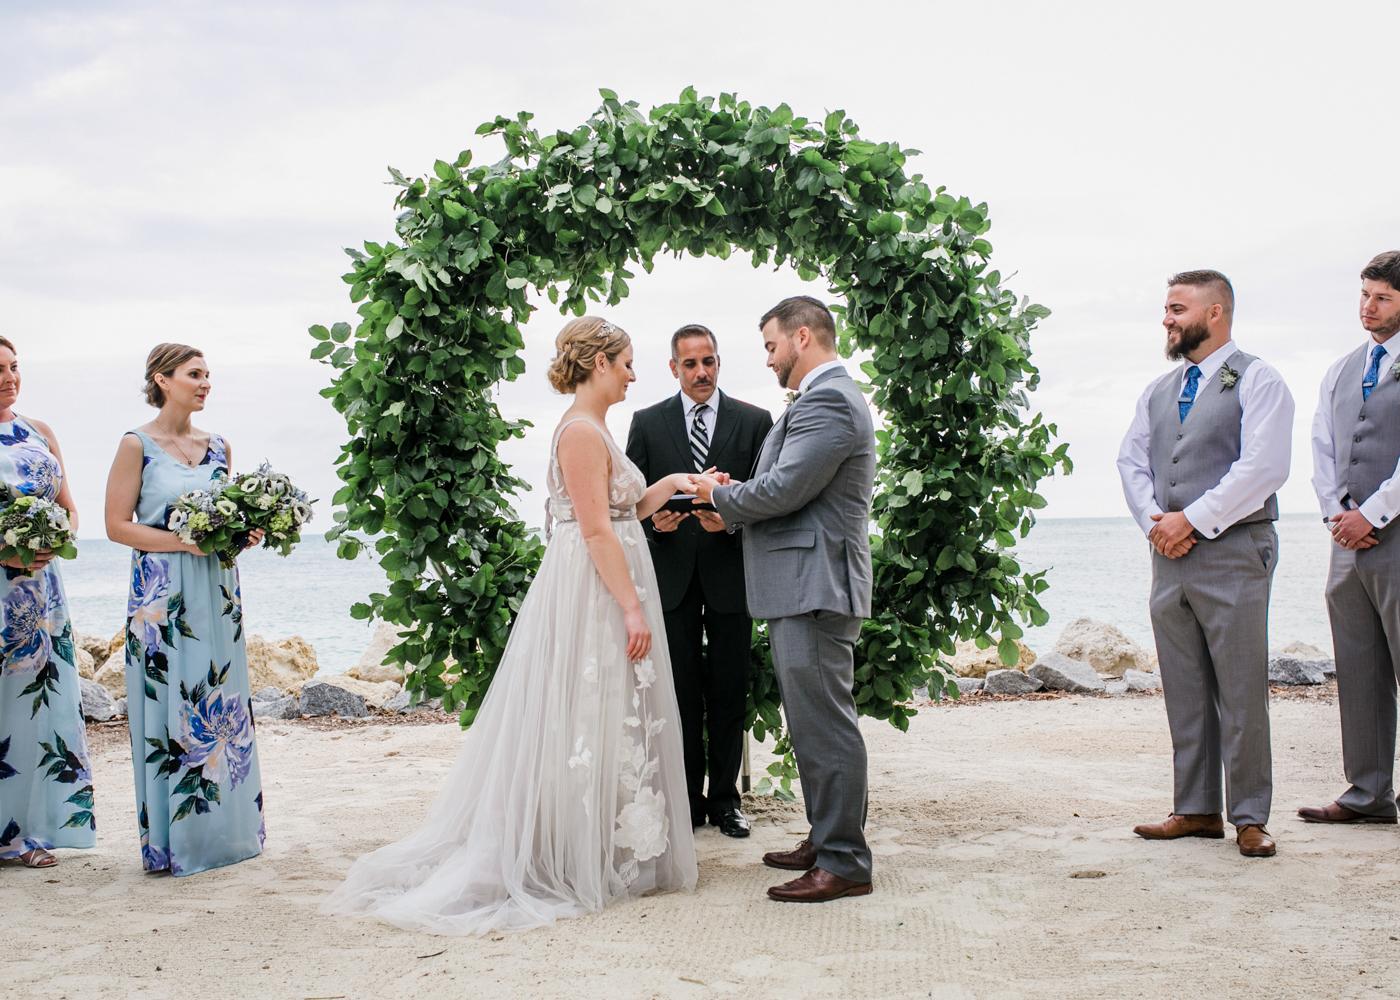 lena perkins, key west wedding photographer, florida wedding, key largo, marathon, islamorada, boho wedding, beach wedding